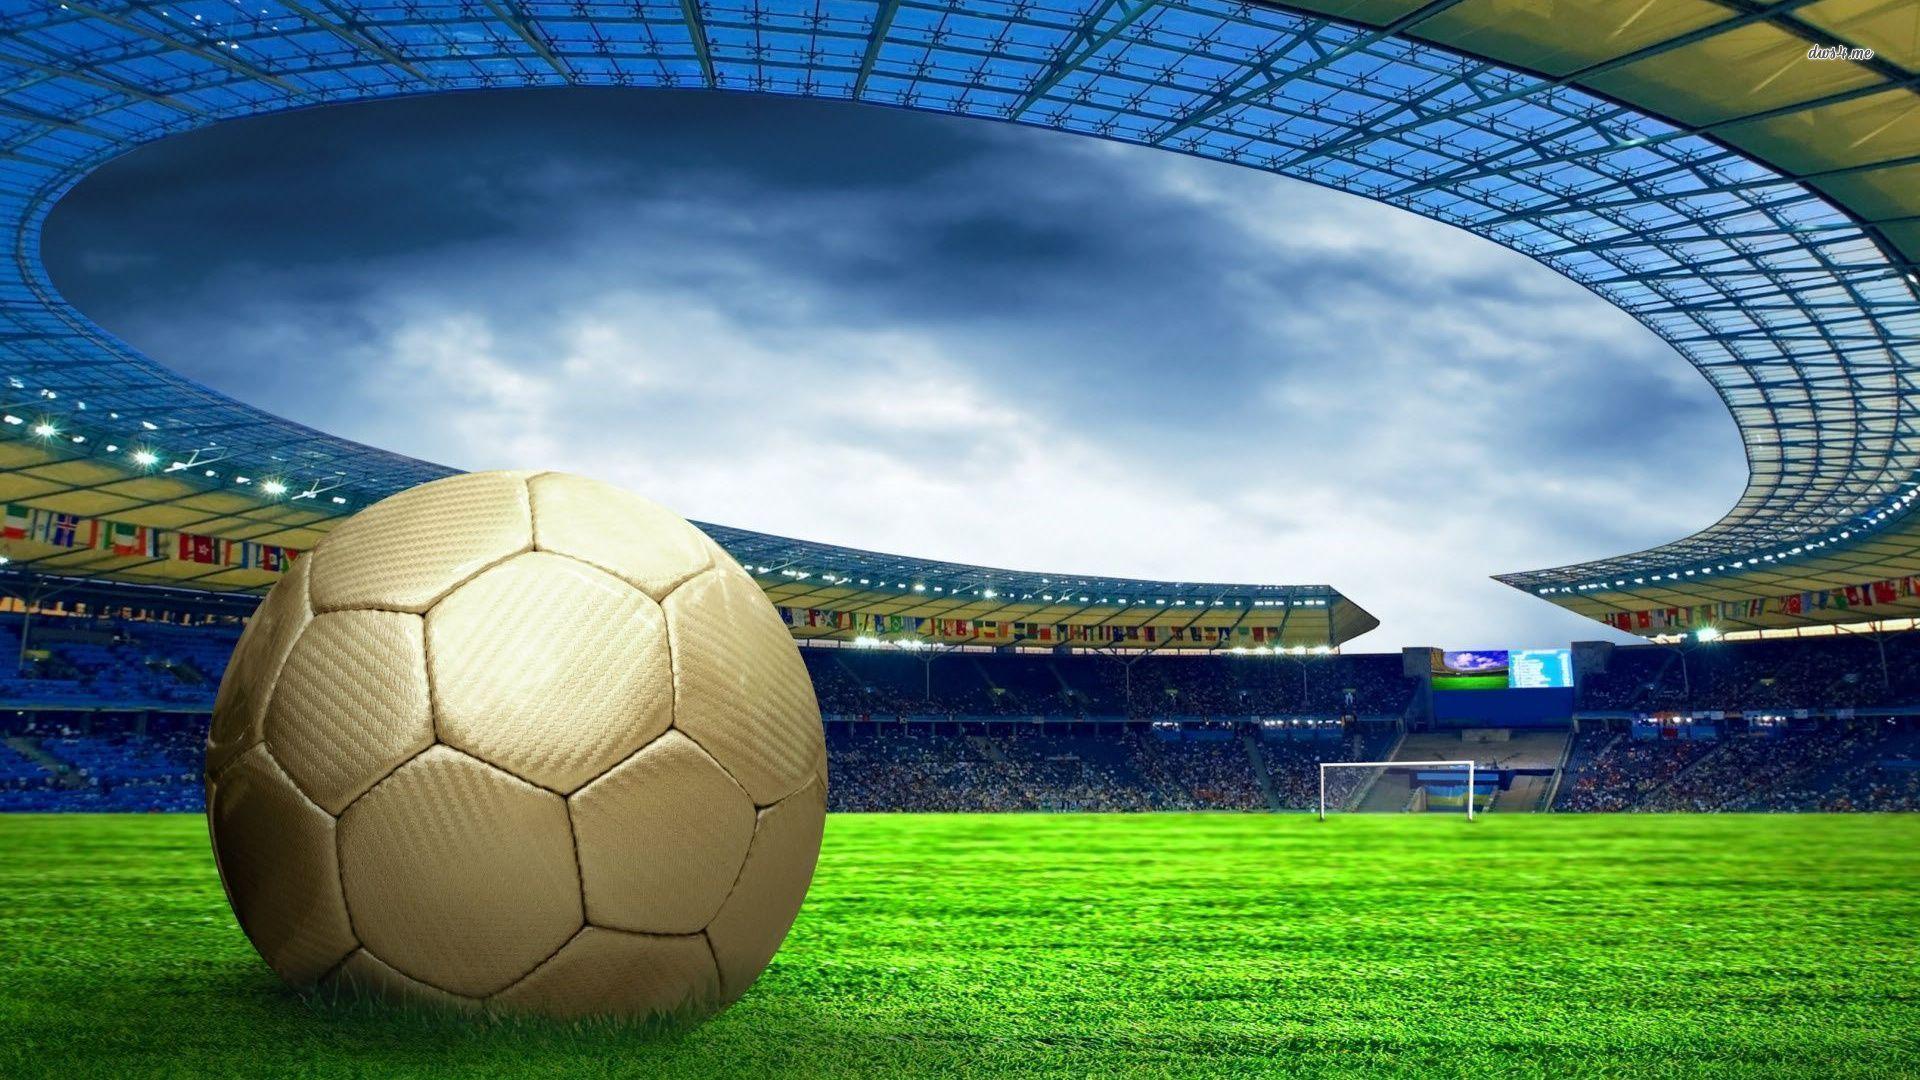 Fondo De Fútbol Hd: Football Stadium Backgrounds